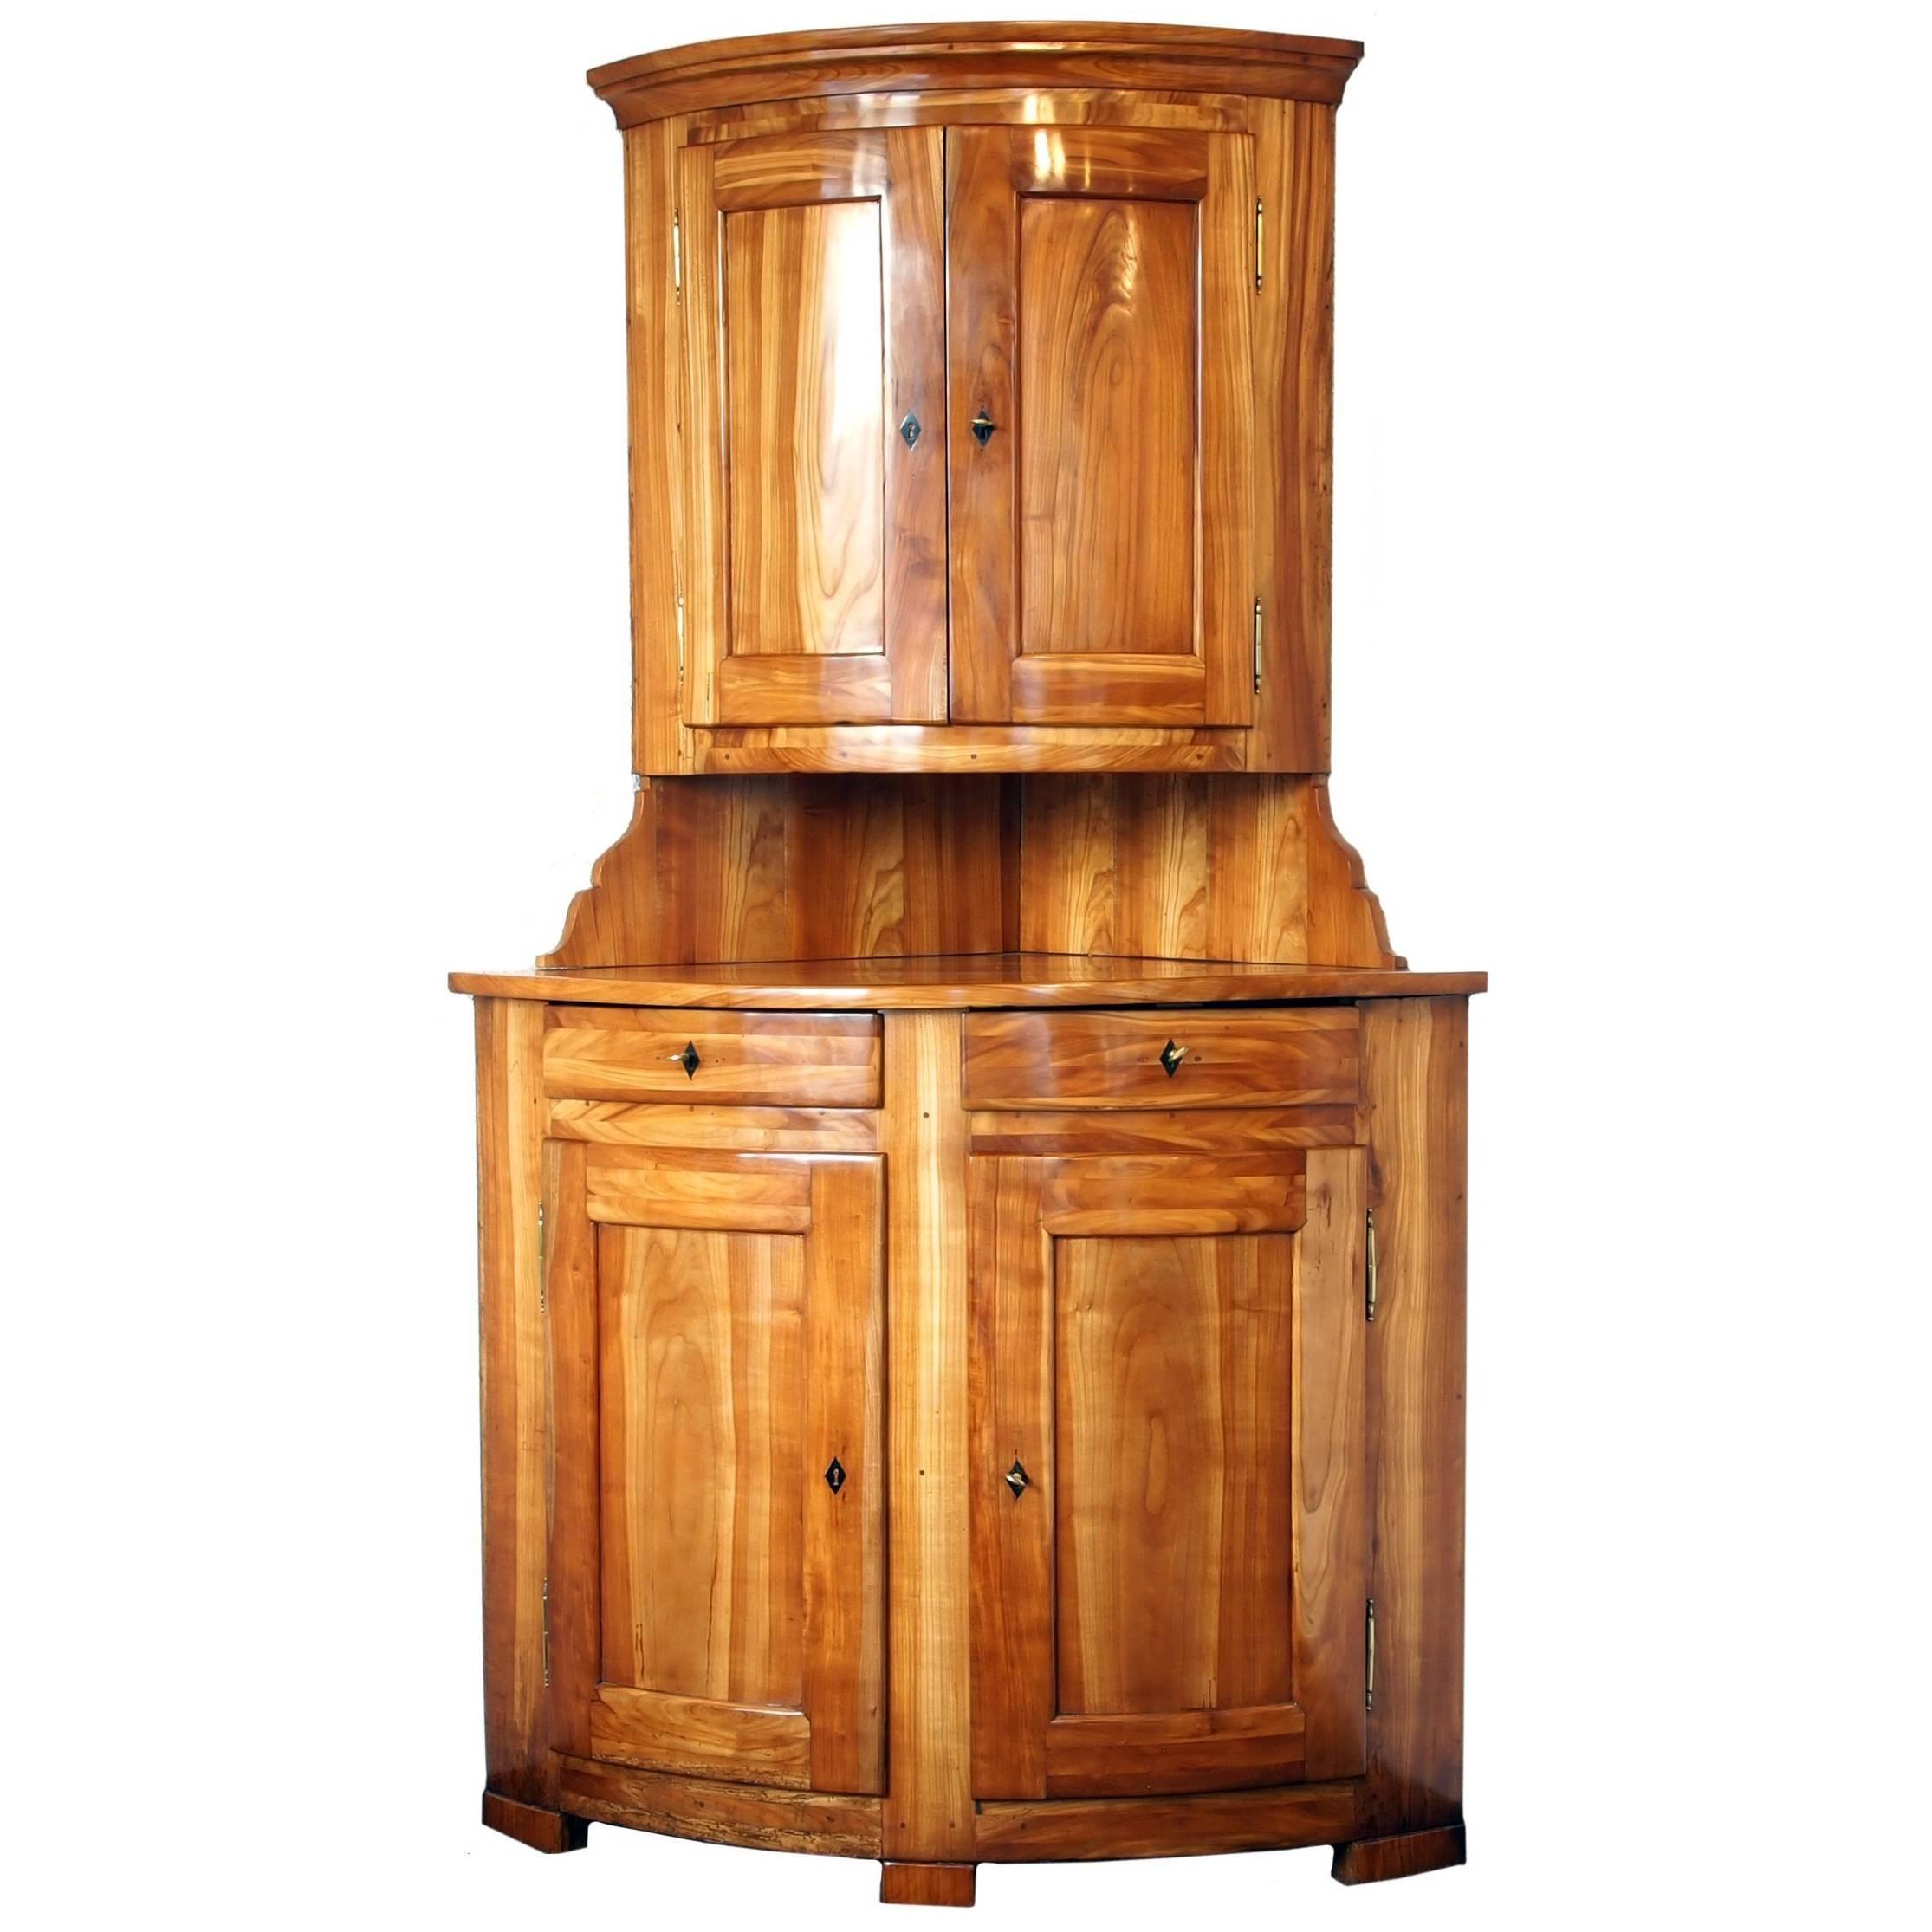 Early 19th Century Solid Cherry Biedermeier Corner Cabinet